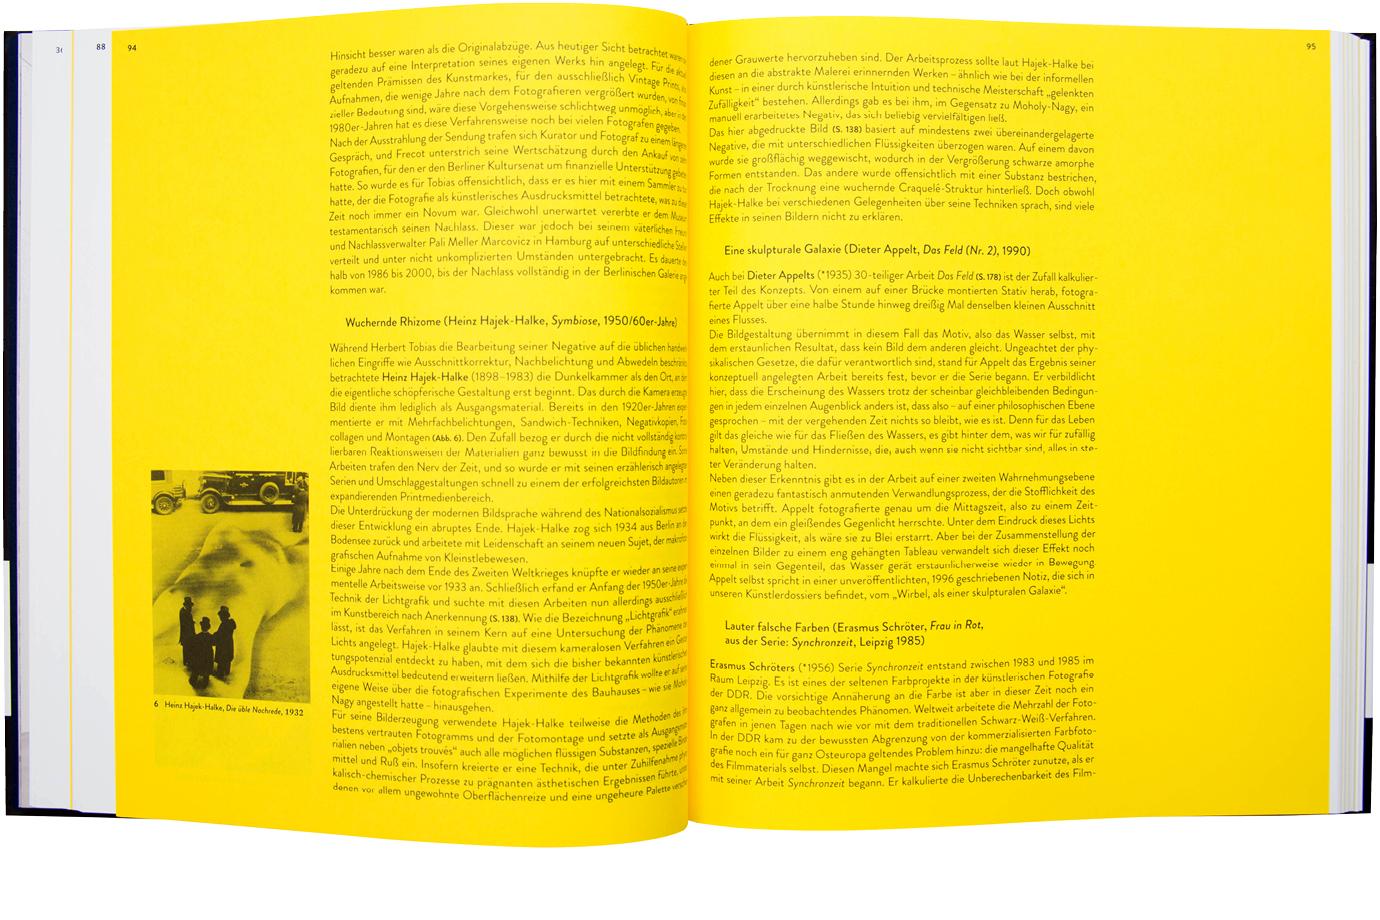 http://e-o-t.de/wordpress/wp-content/uploads/2017/06/2015_eot-BG-Jubilaeum-Book-11.jpg